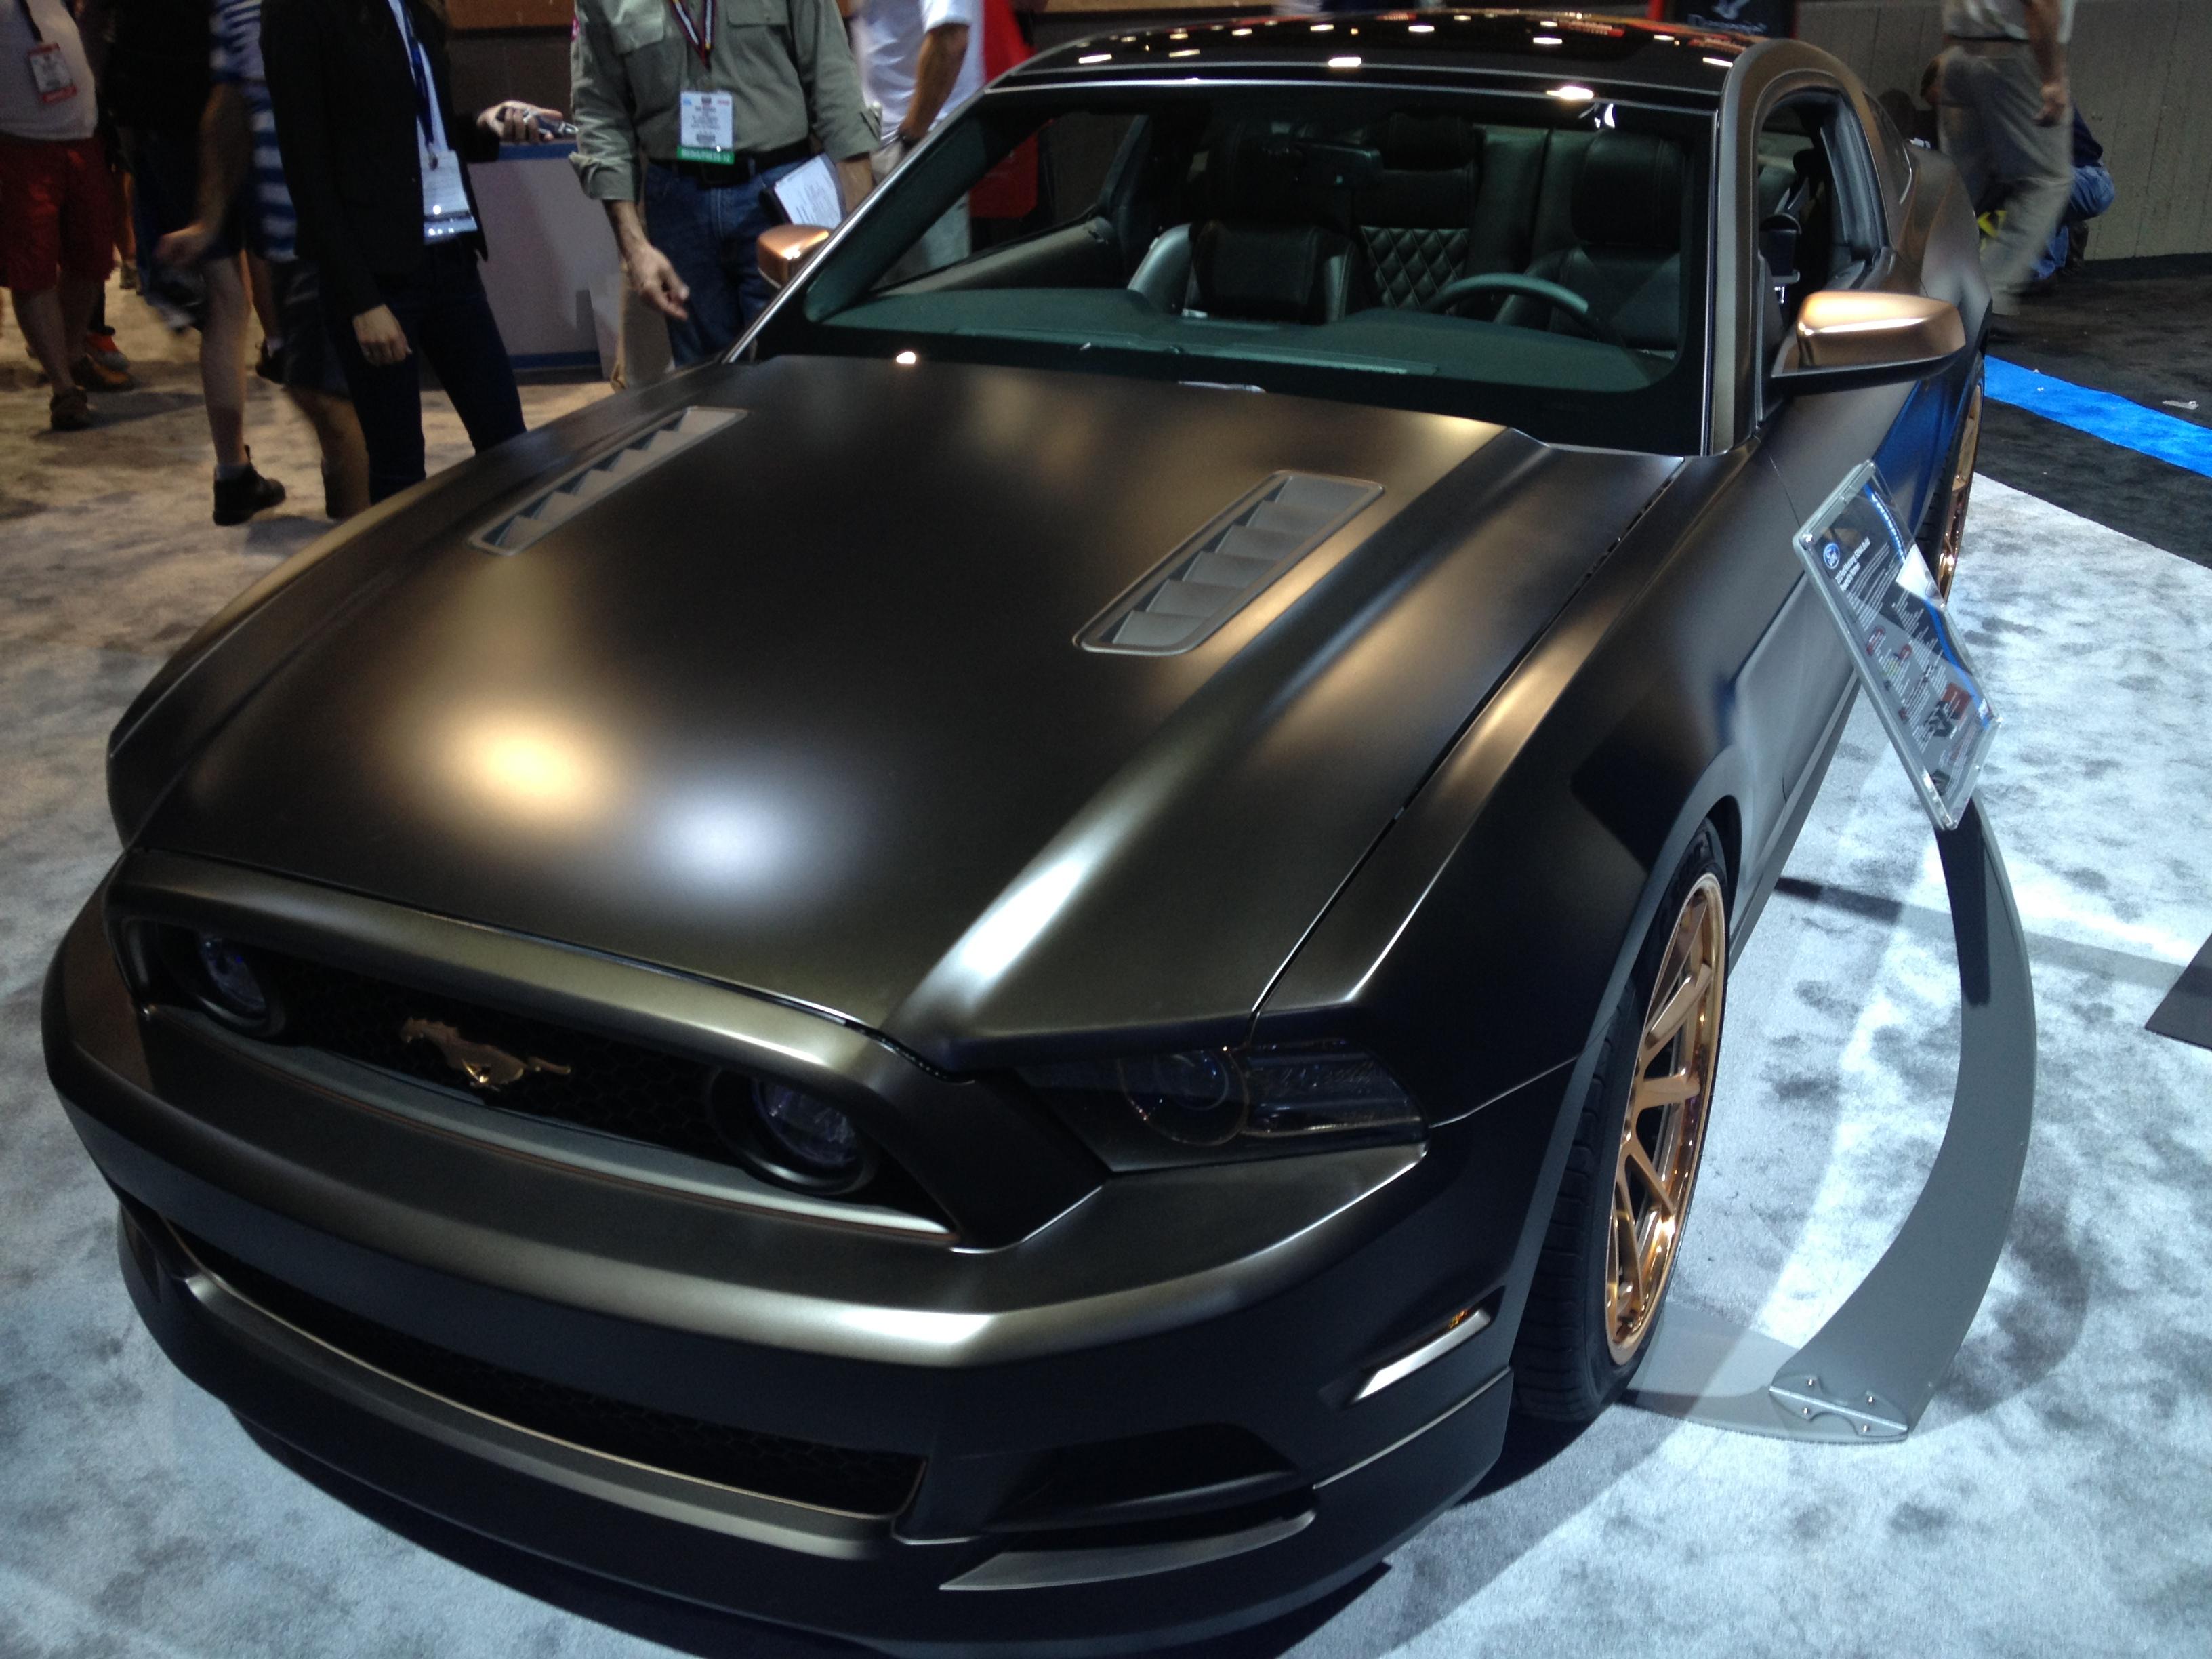 Fog Better Automotive Lighting Blog Hid 4 X Lights 7 Inch Black Red Housing Wiring Lightbar Chrome Powered By Women Mustang Build